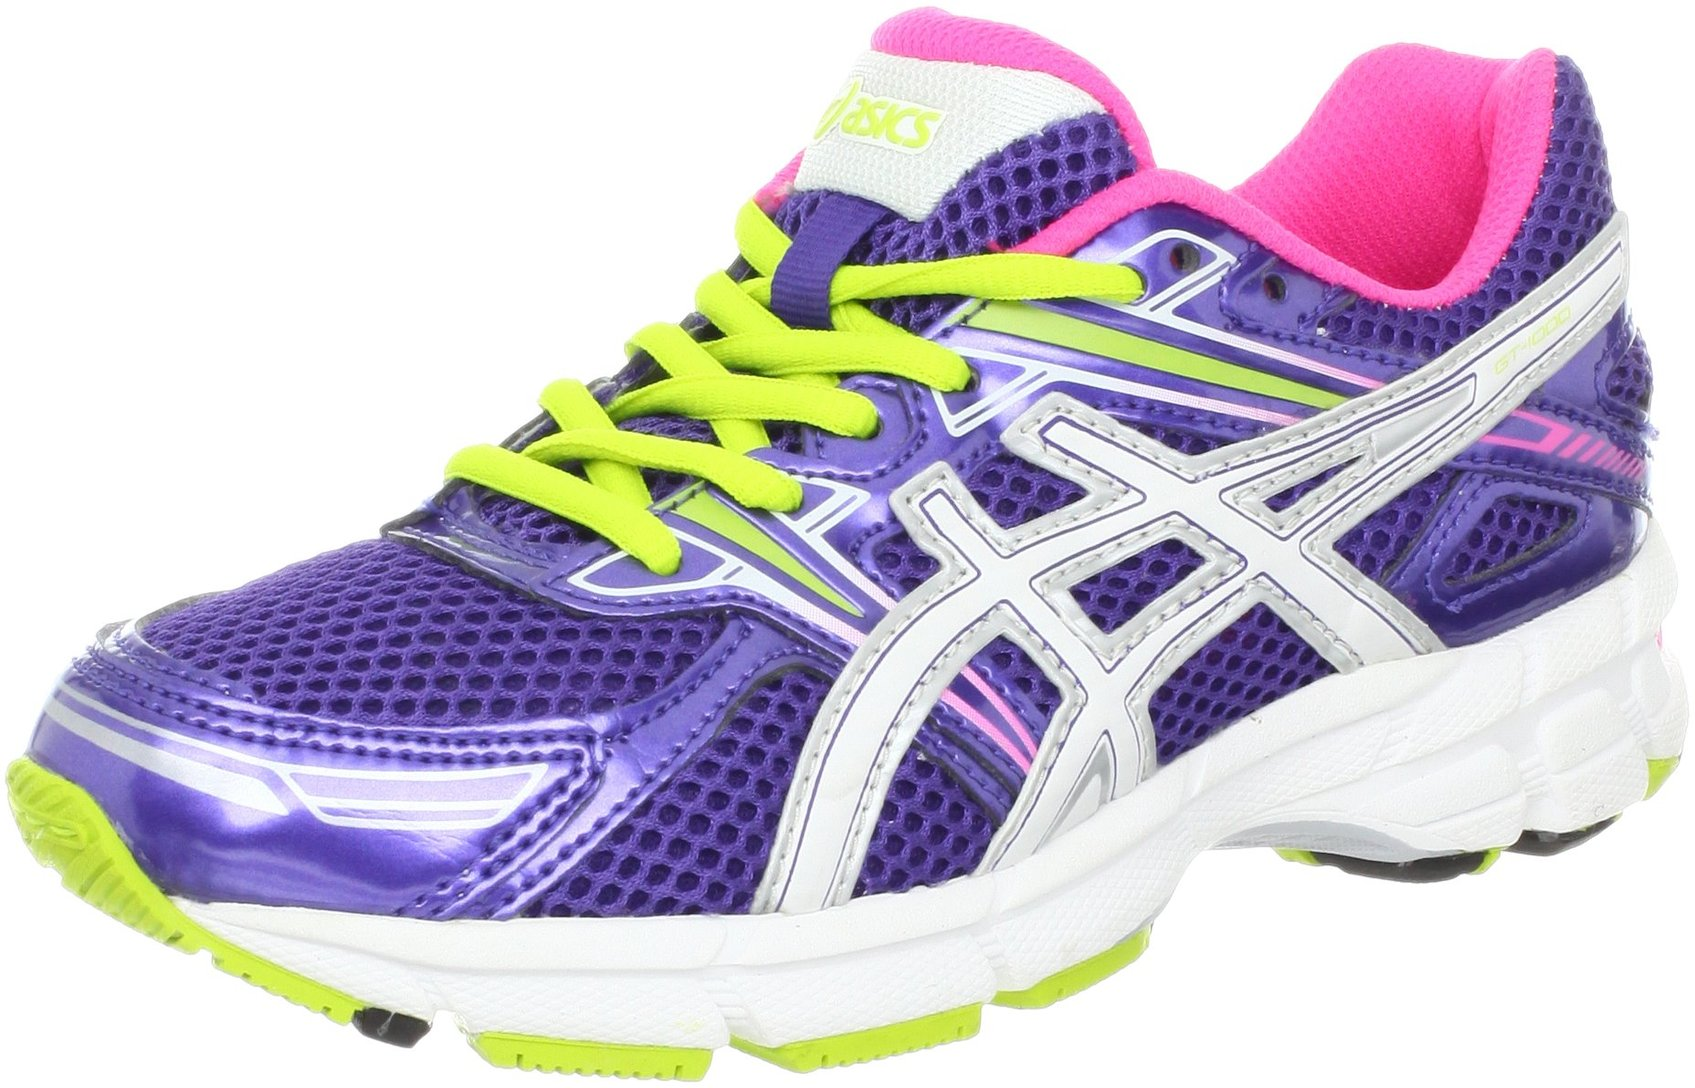 ce5db0c6c068 Asics 60% Off GT-1000 GS Running Shoe